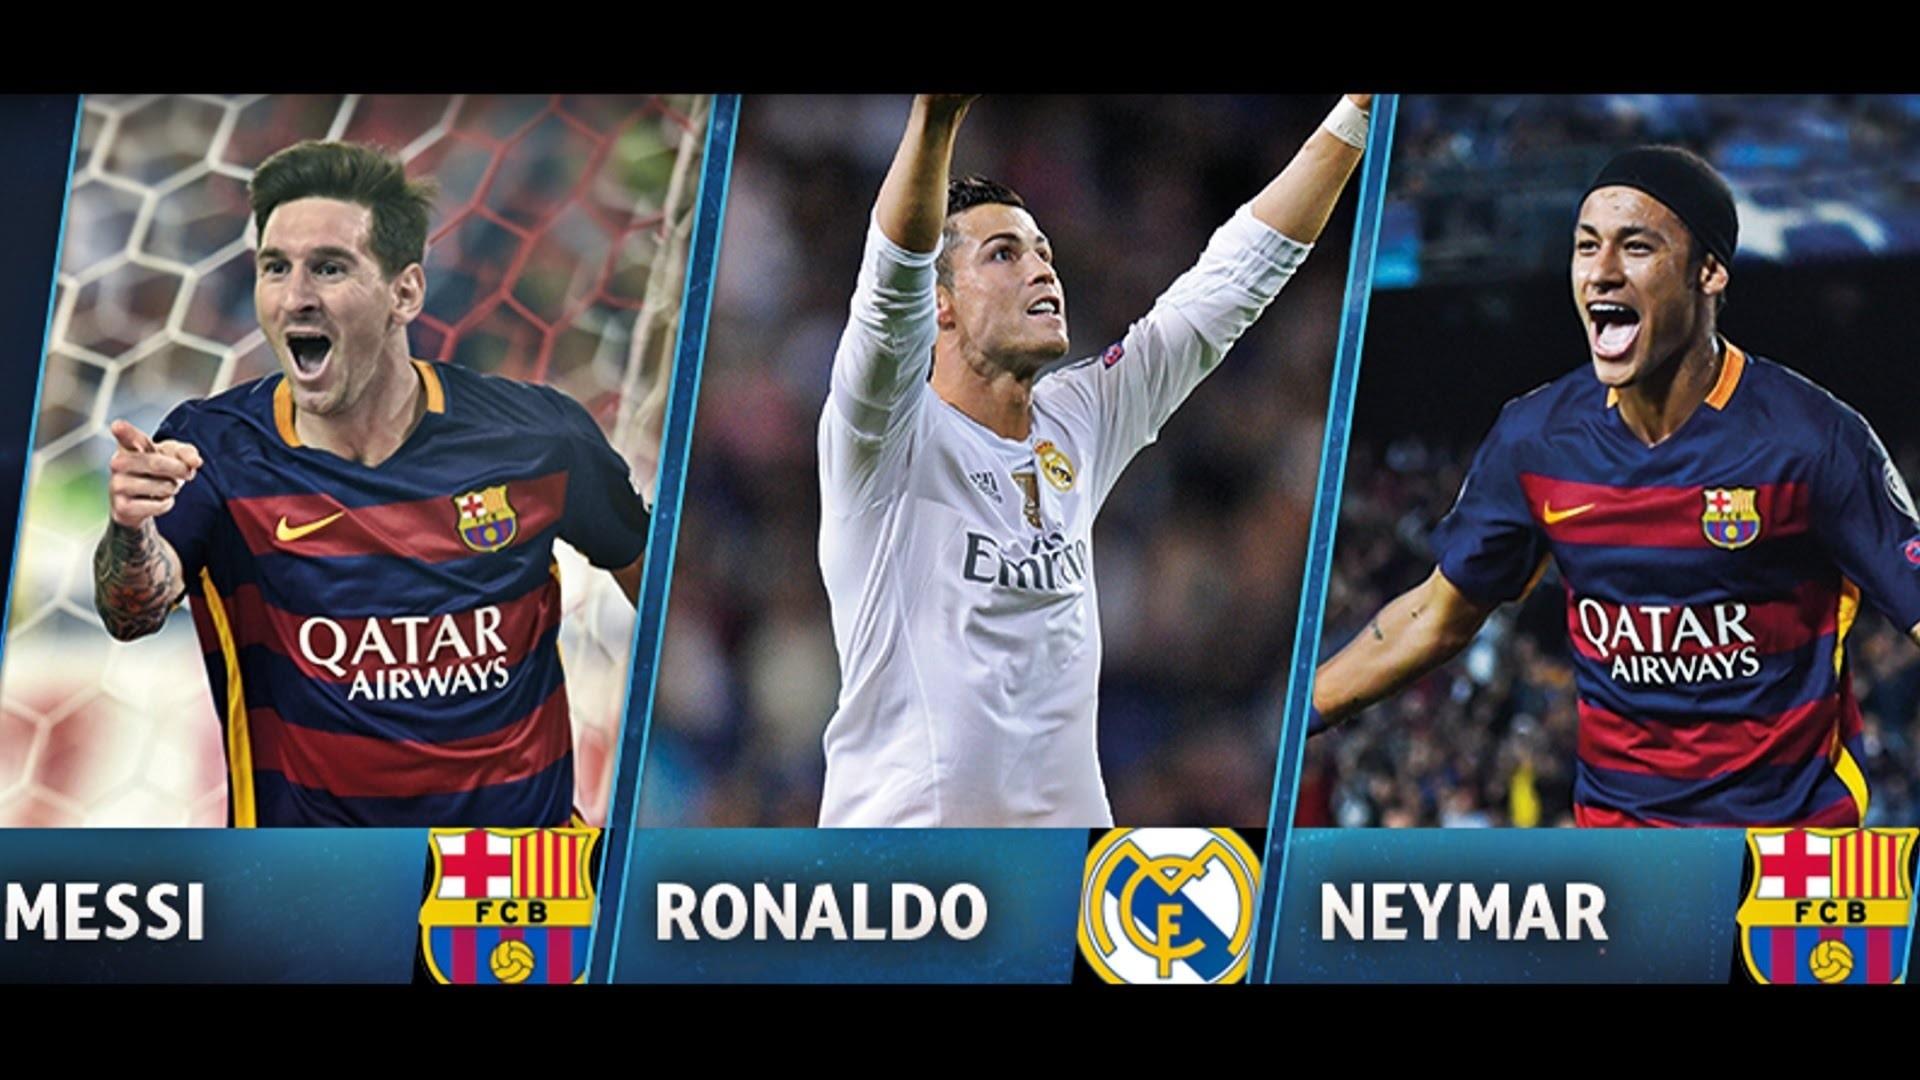 Messi Vs Ronaldo Wallpaper 2018 68 Pictures